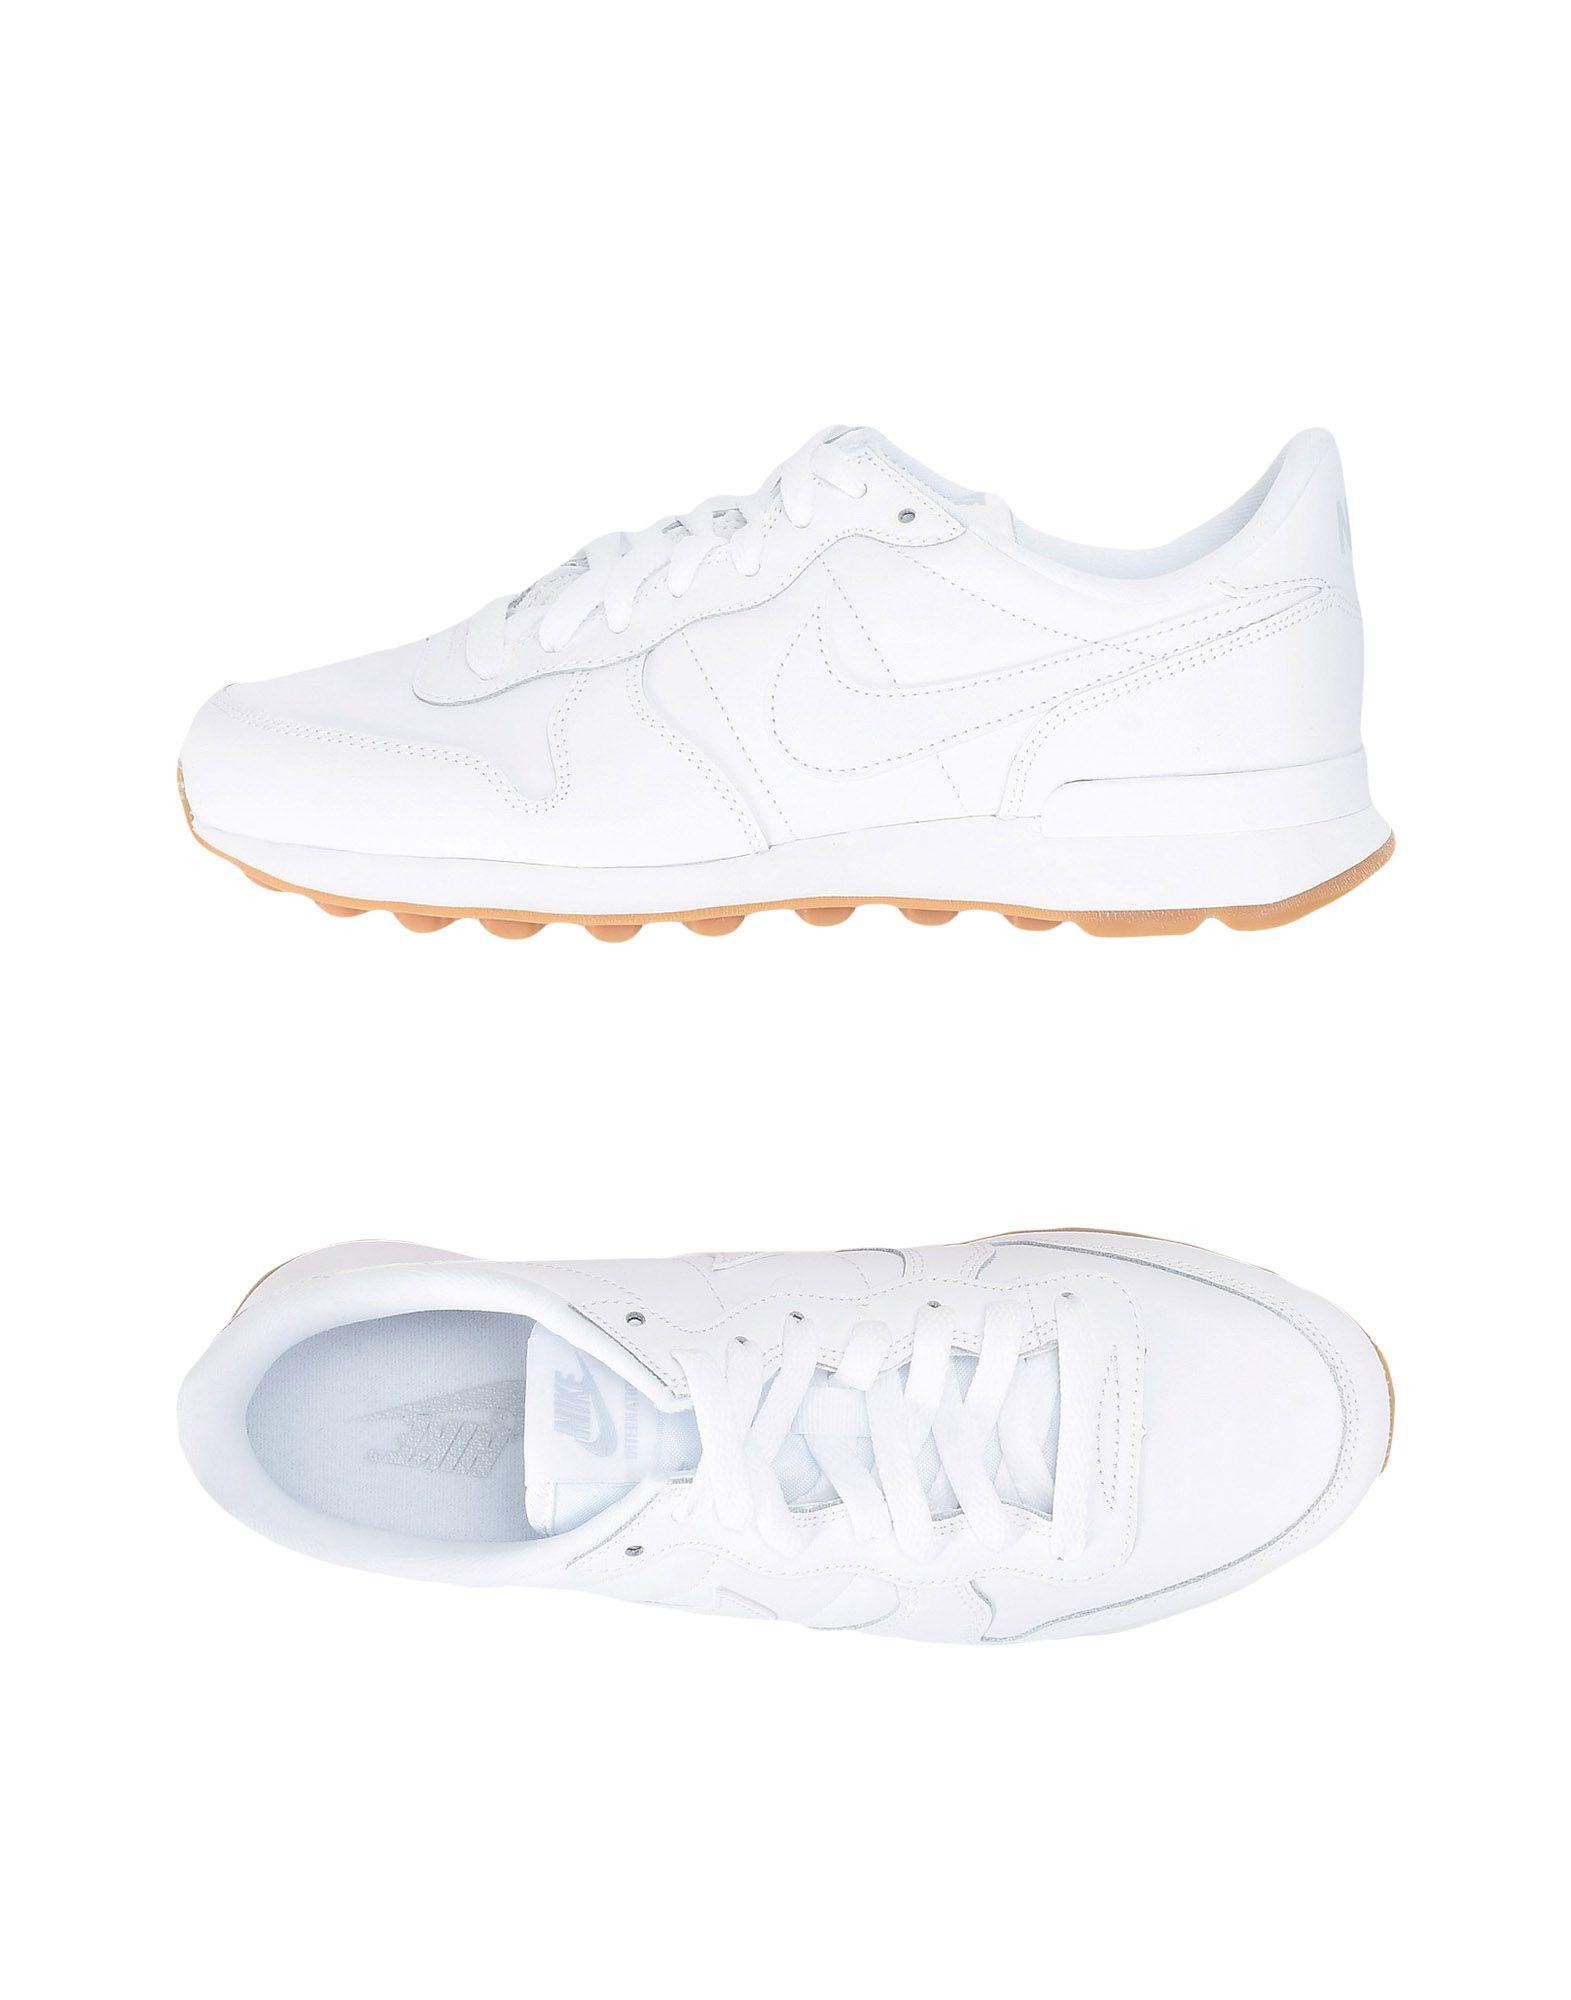 Nike  Internationalist beliebte  11482017AL Gute Qualität beliebte Internationalist Schuhe 7ecf14